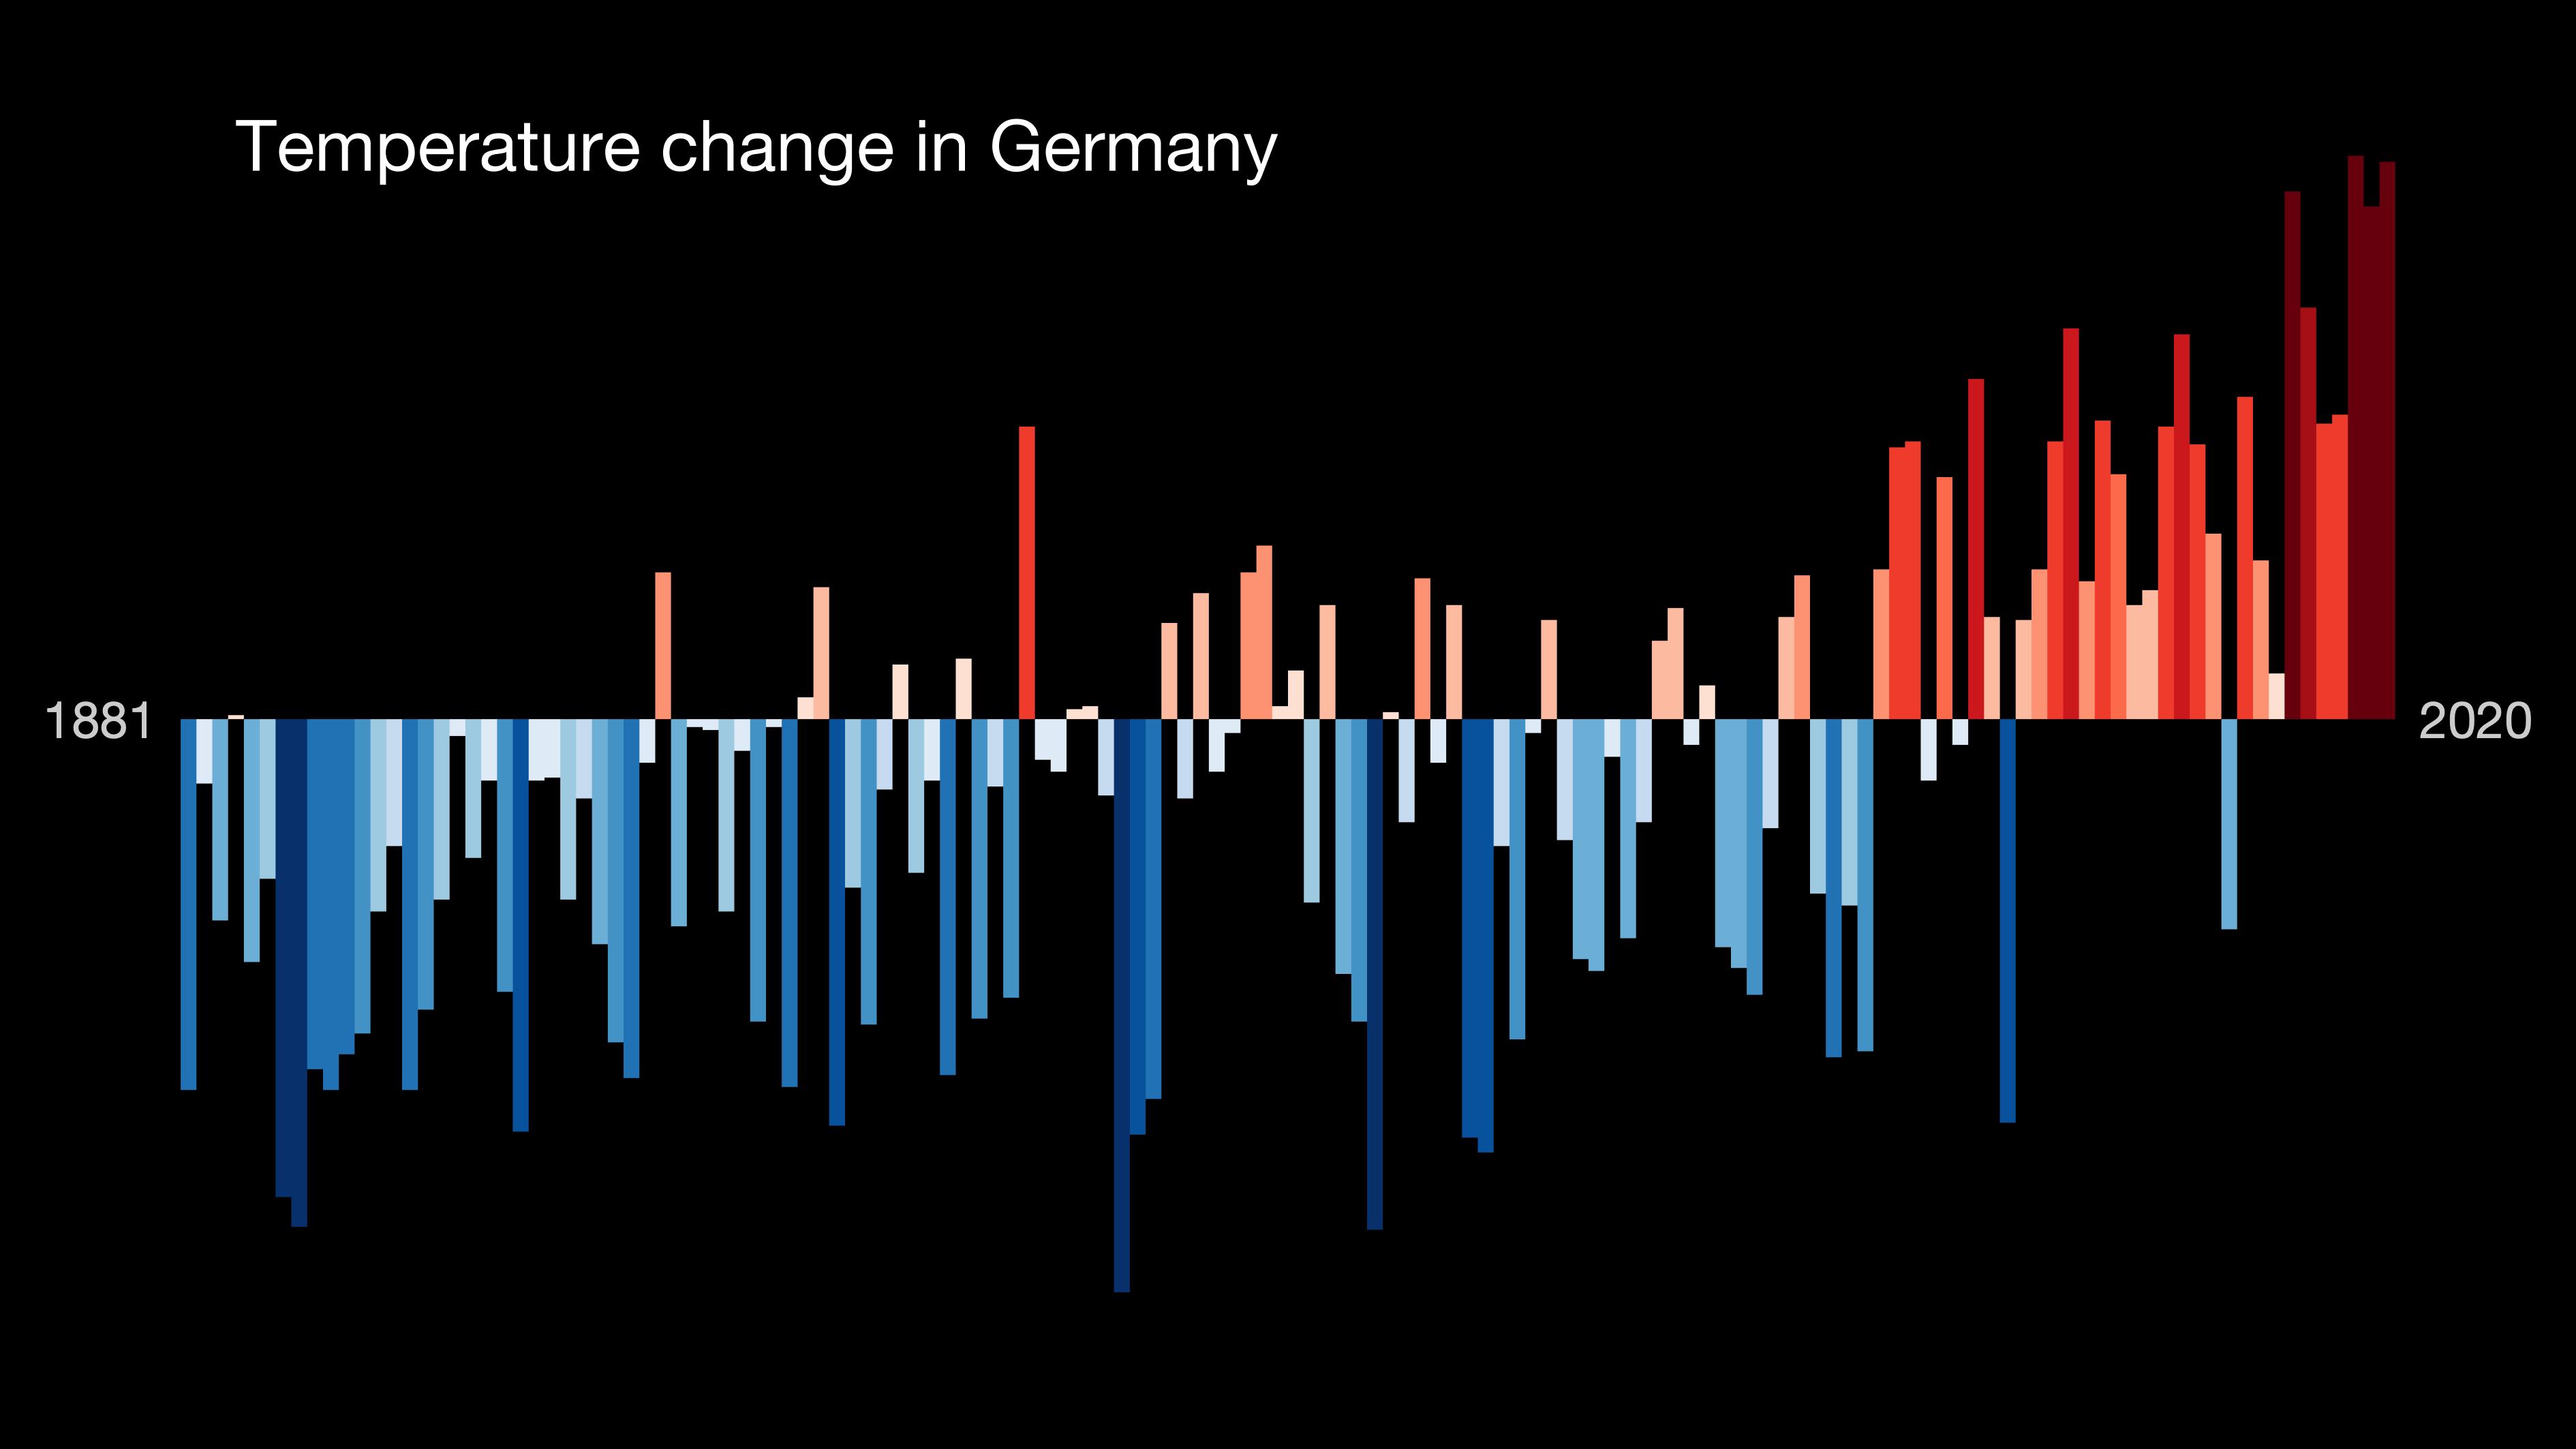 Temperaturzunahme in Deutschland. © Prof. Ed Hawkins (University of Reading) · www.showyourstripes.info